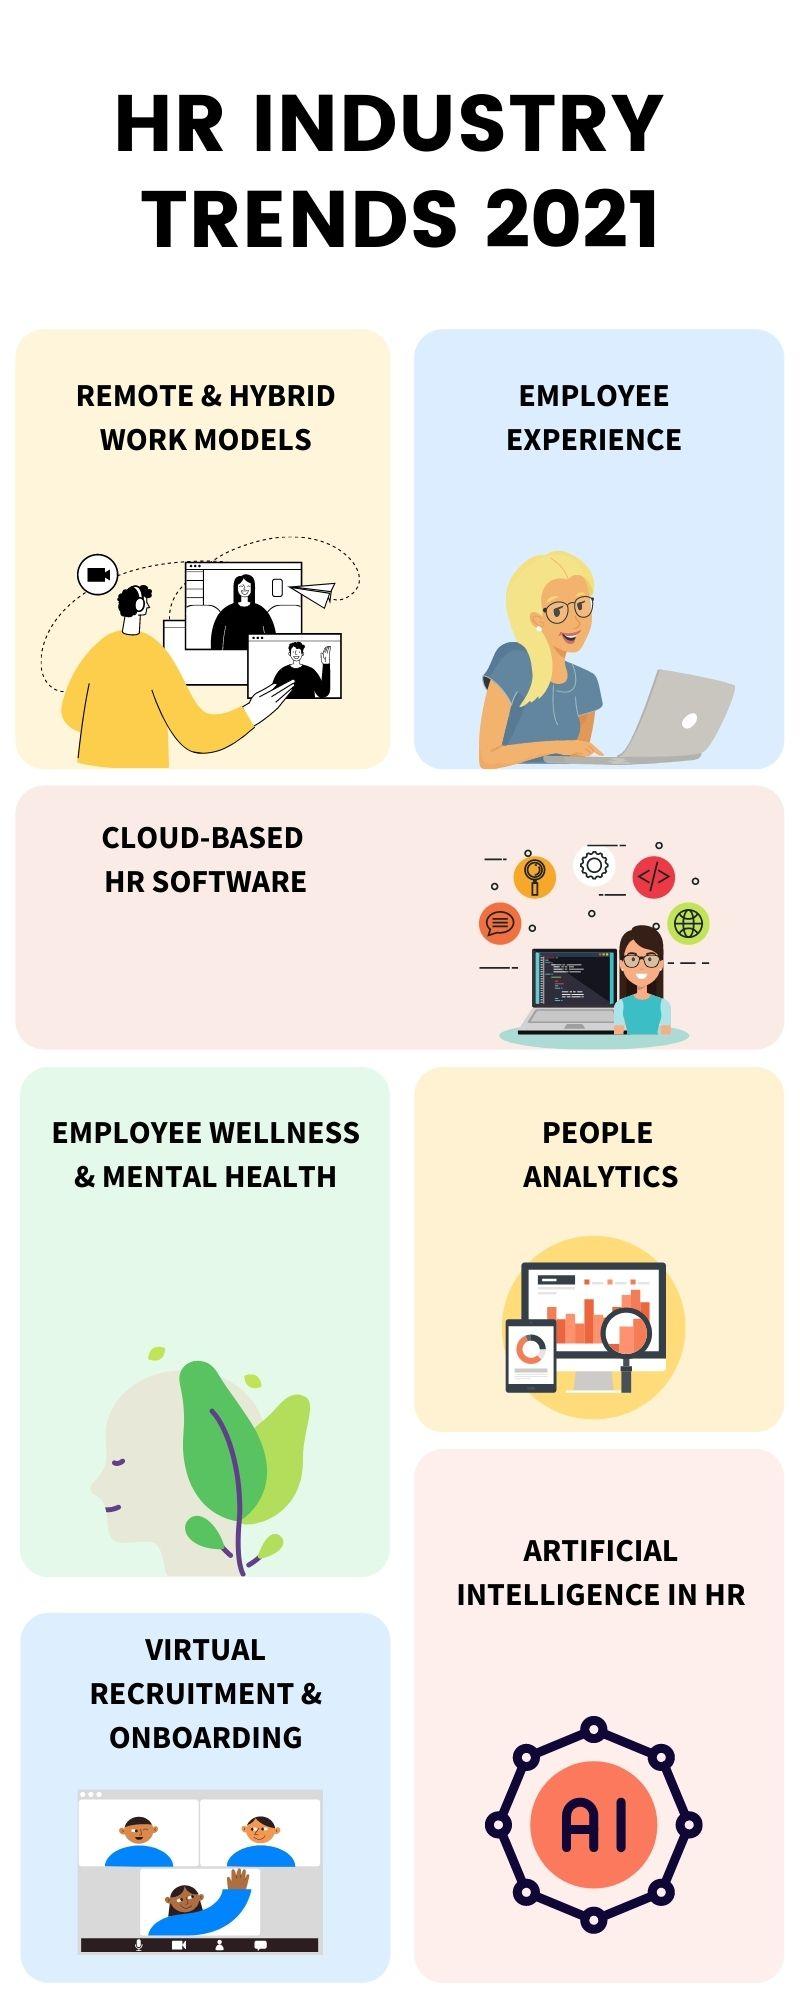 HR Industry Trends 2021